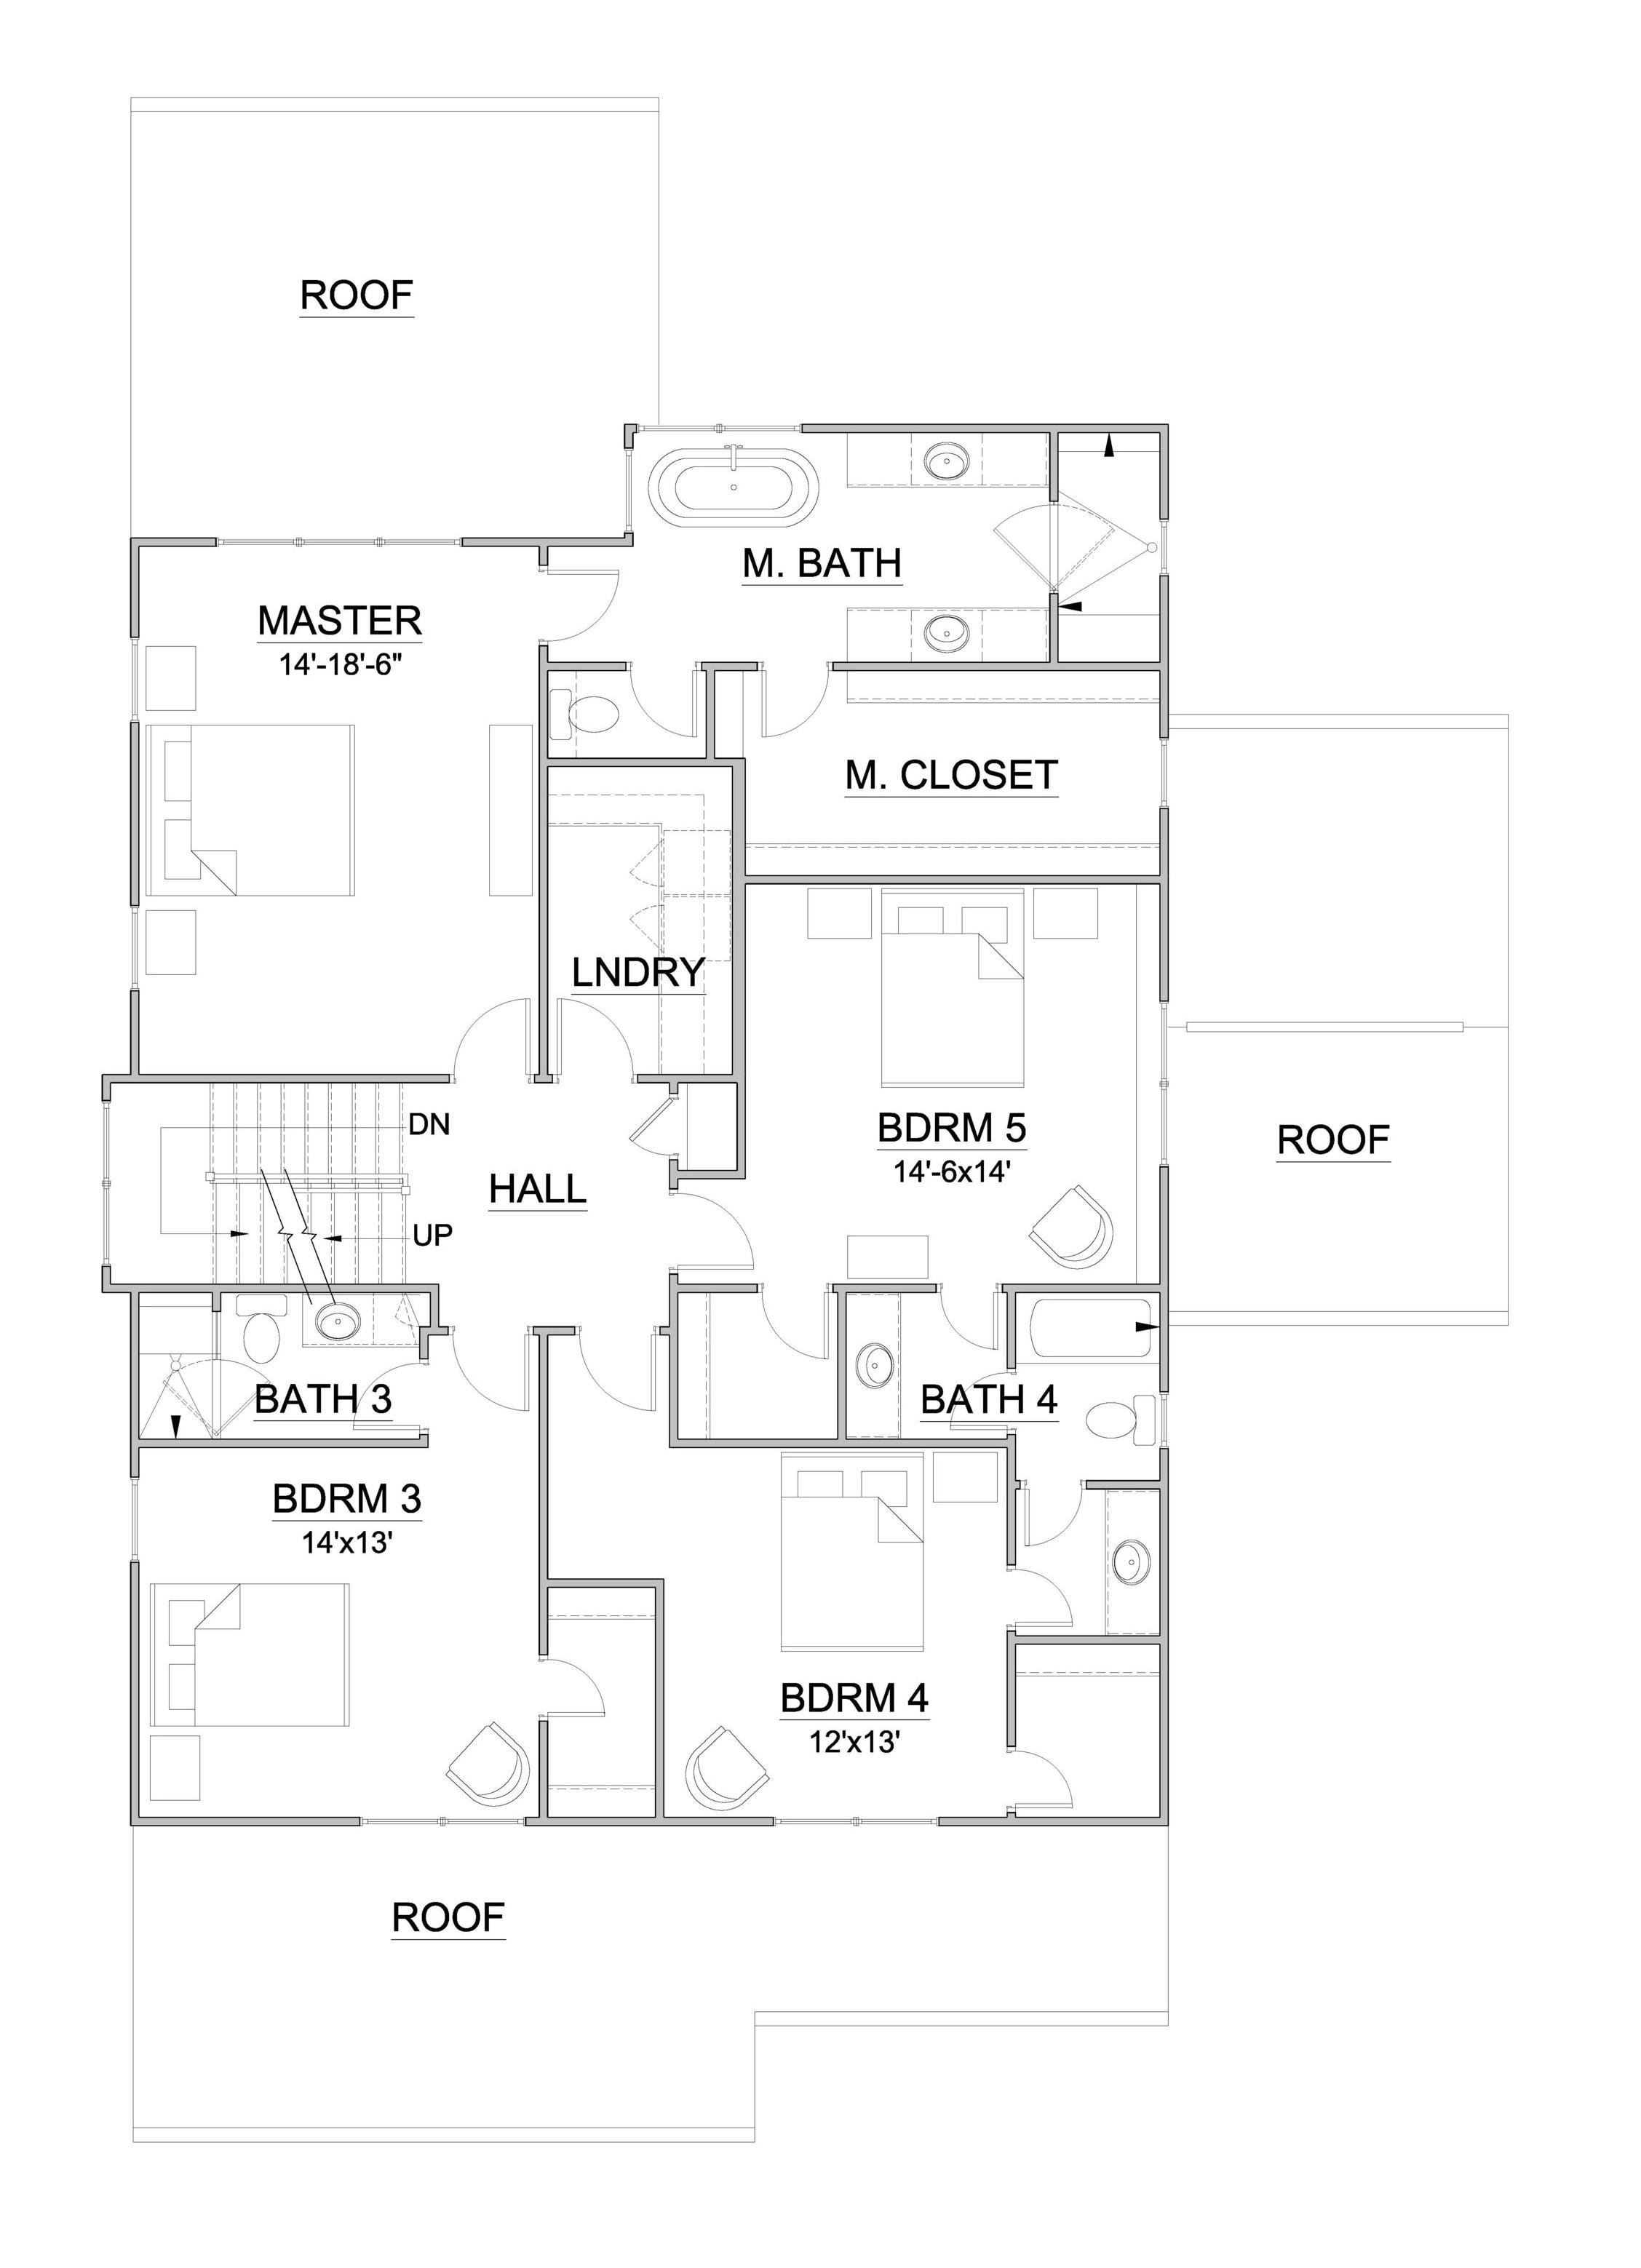 CC_Second+Floor_24x36.jpg